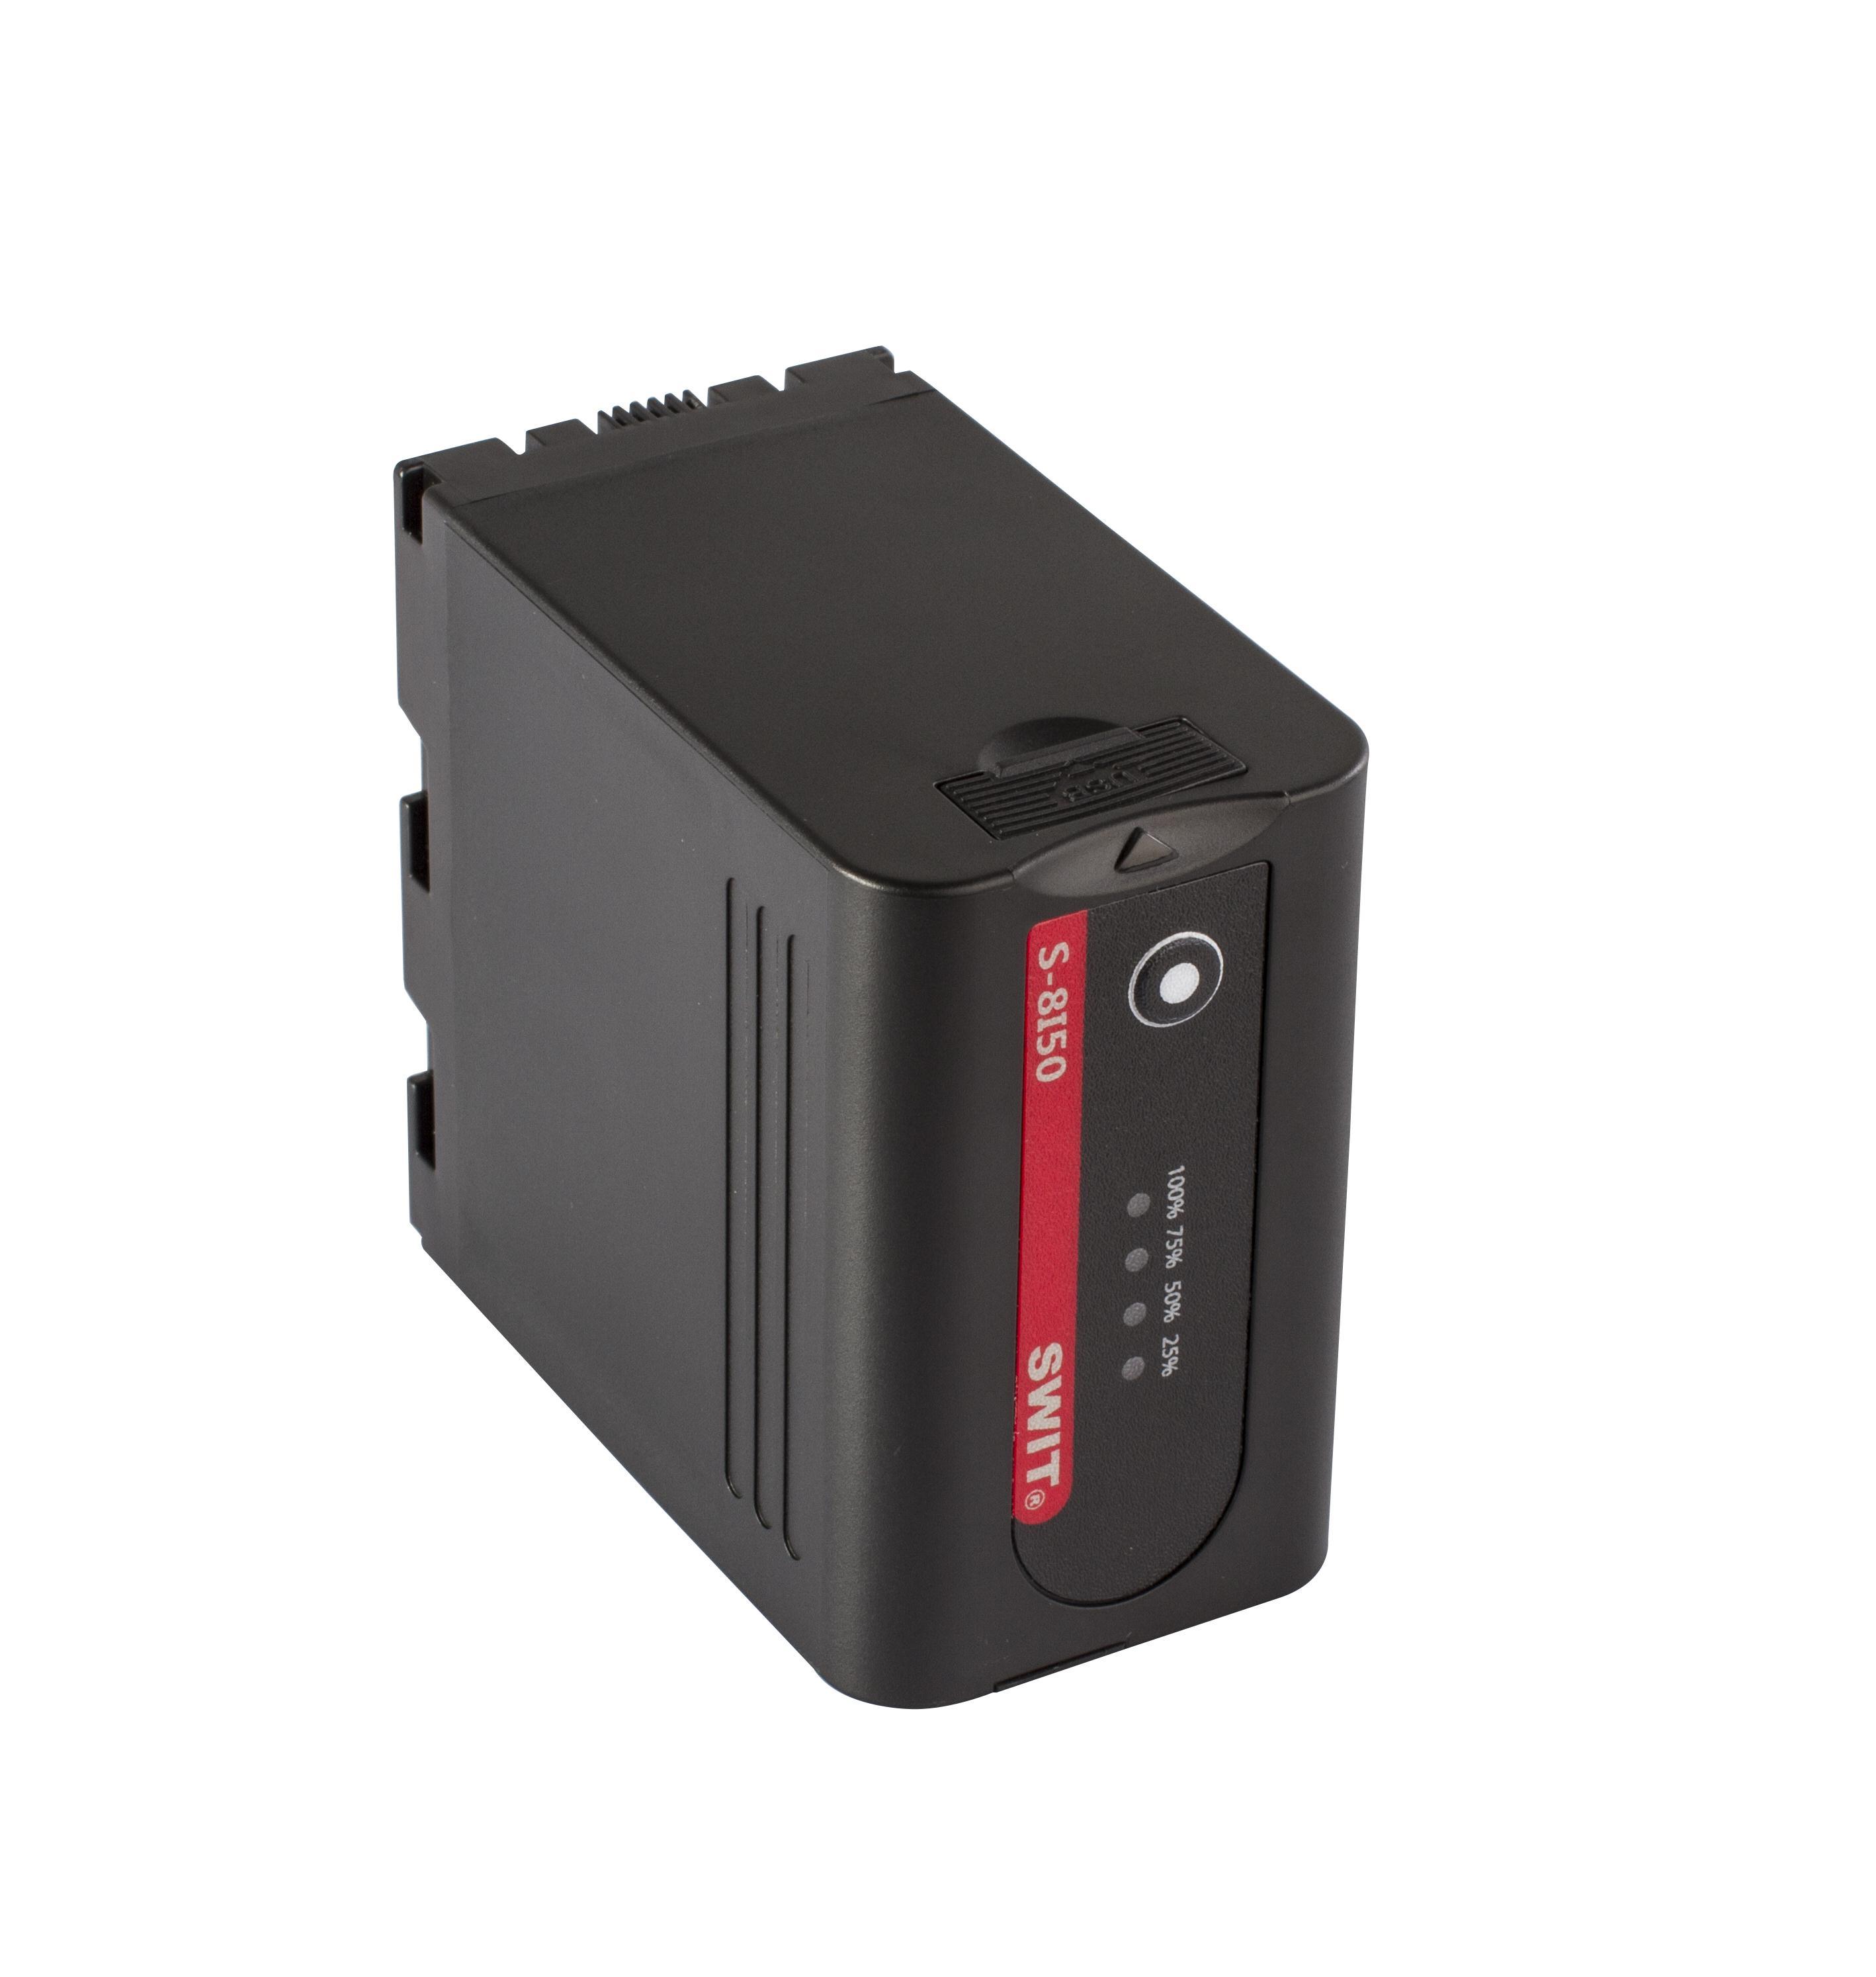 S8I50 Image